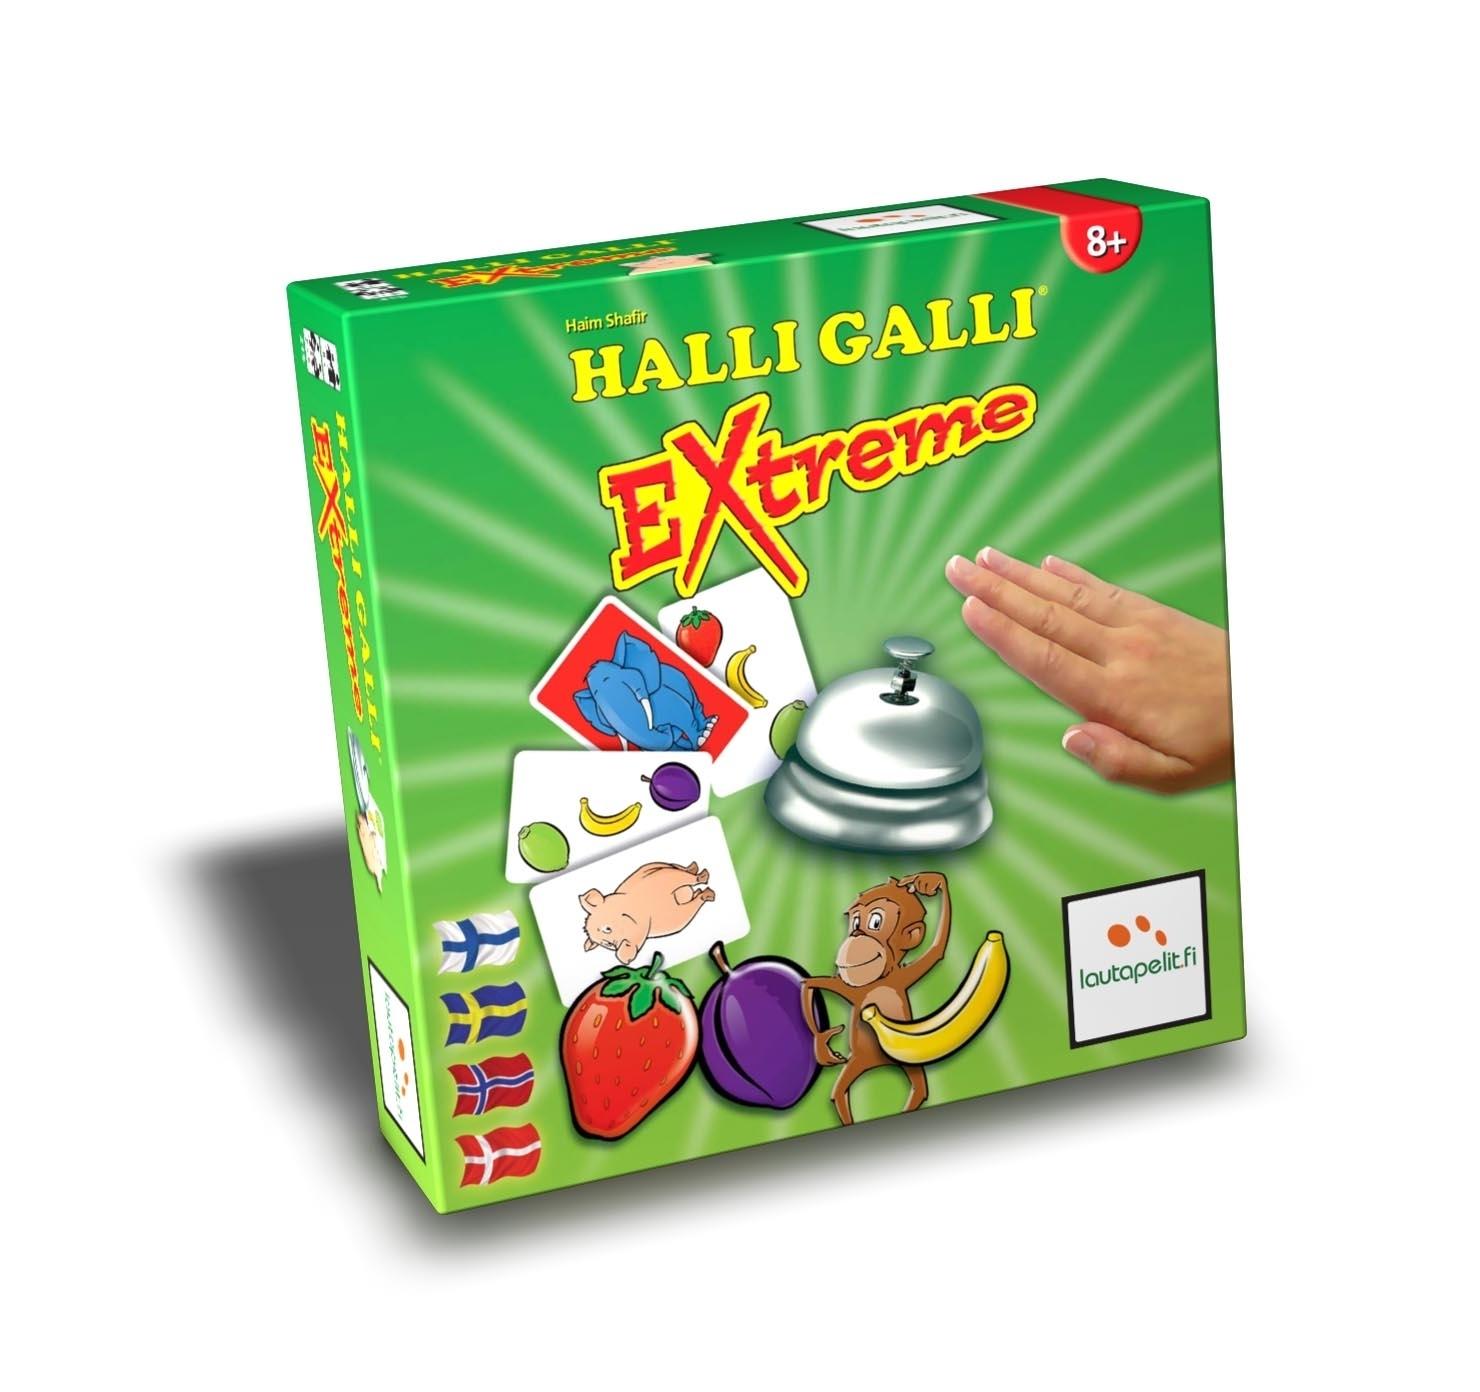 Halli Galli Extreme | Lautapelit.fi